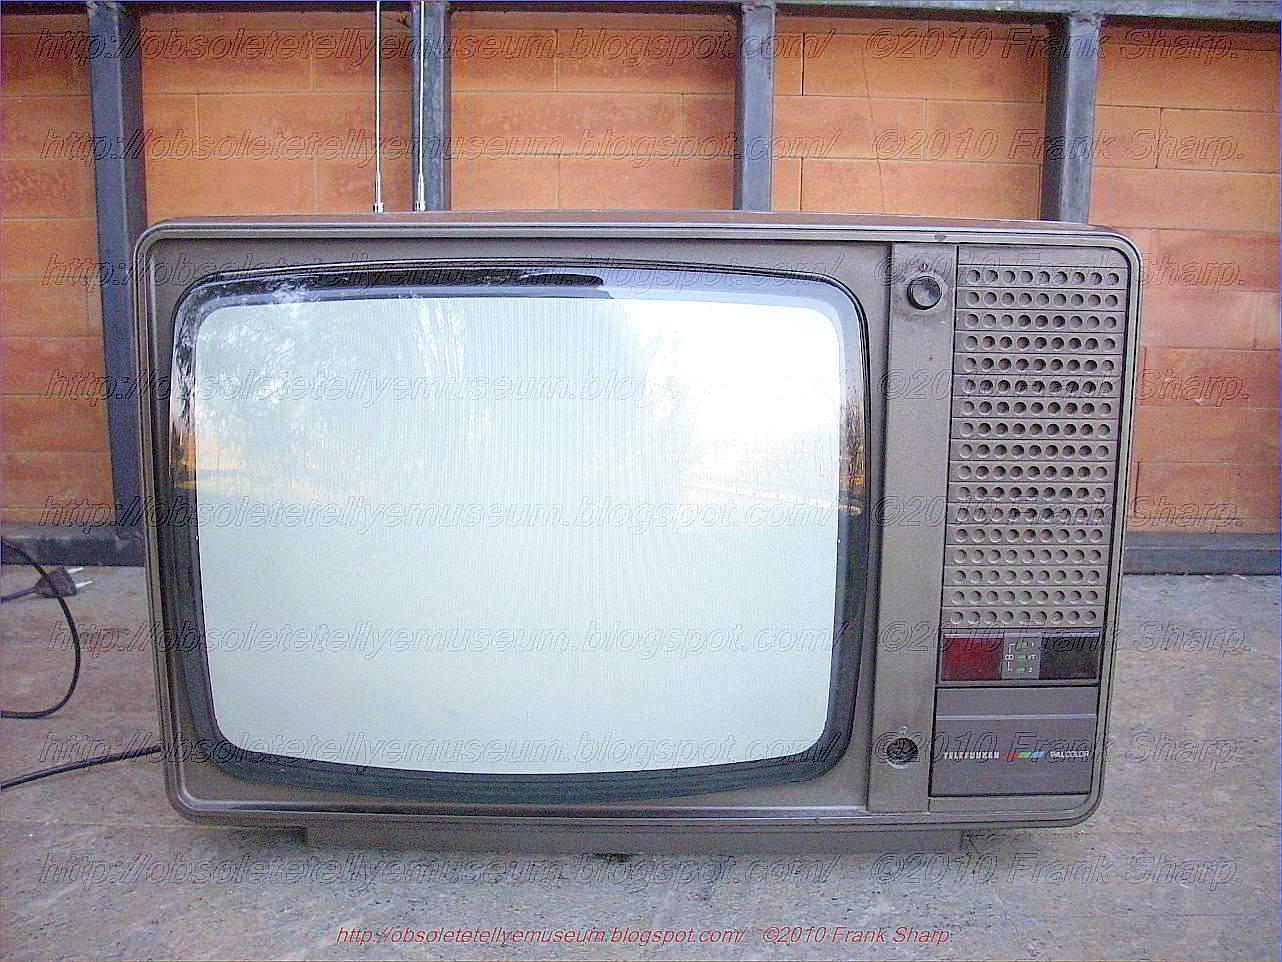 Obsolete Technology Tellye !: TELEFUNKEN PALCOLOR V3210 YEAR